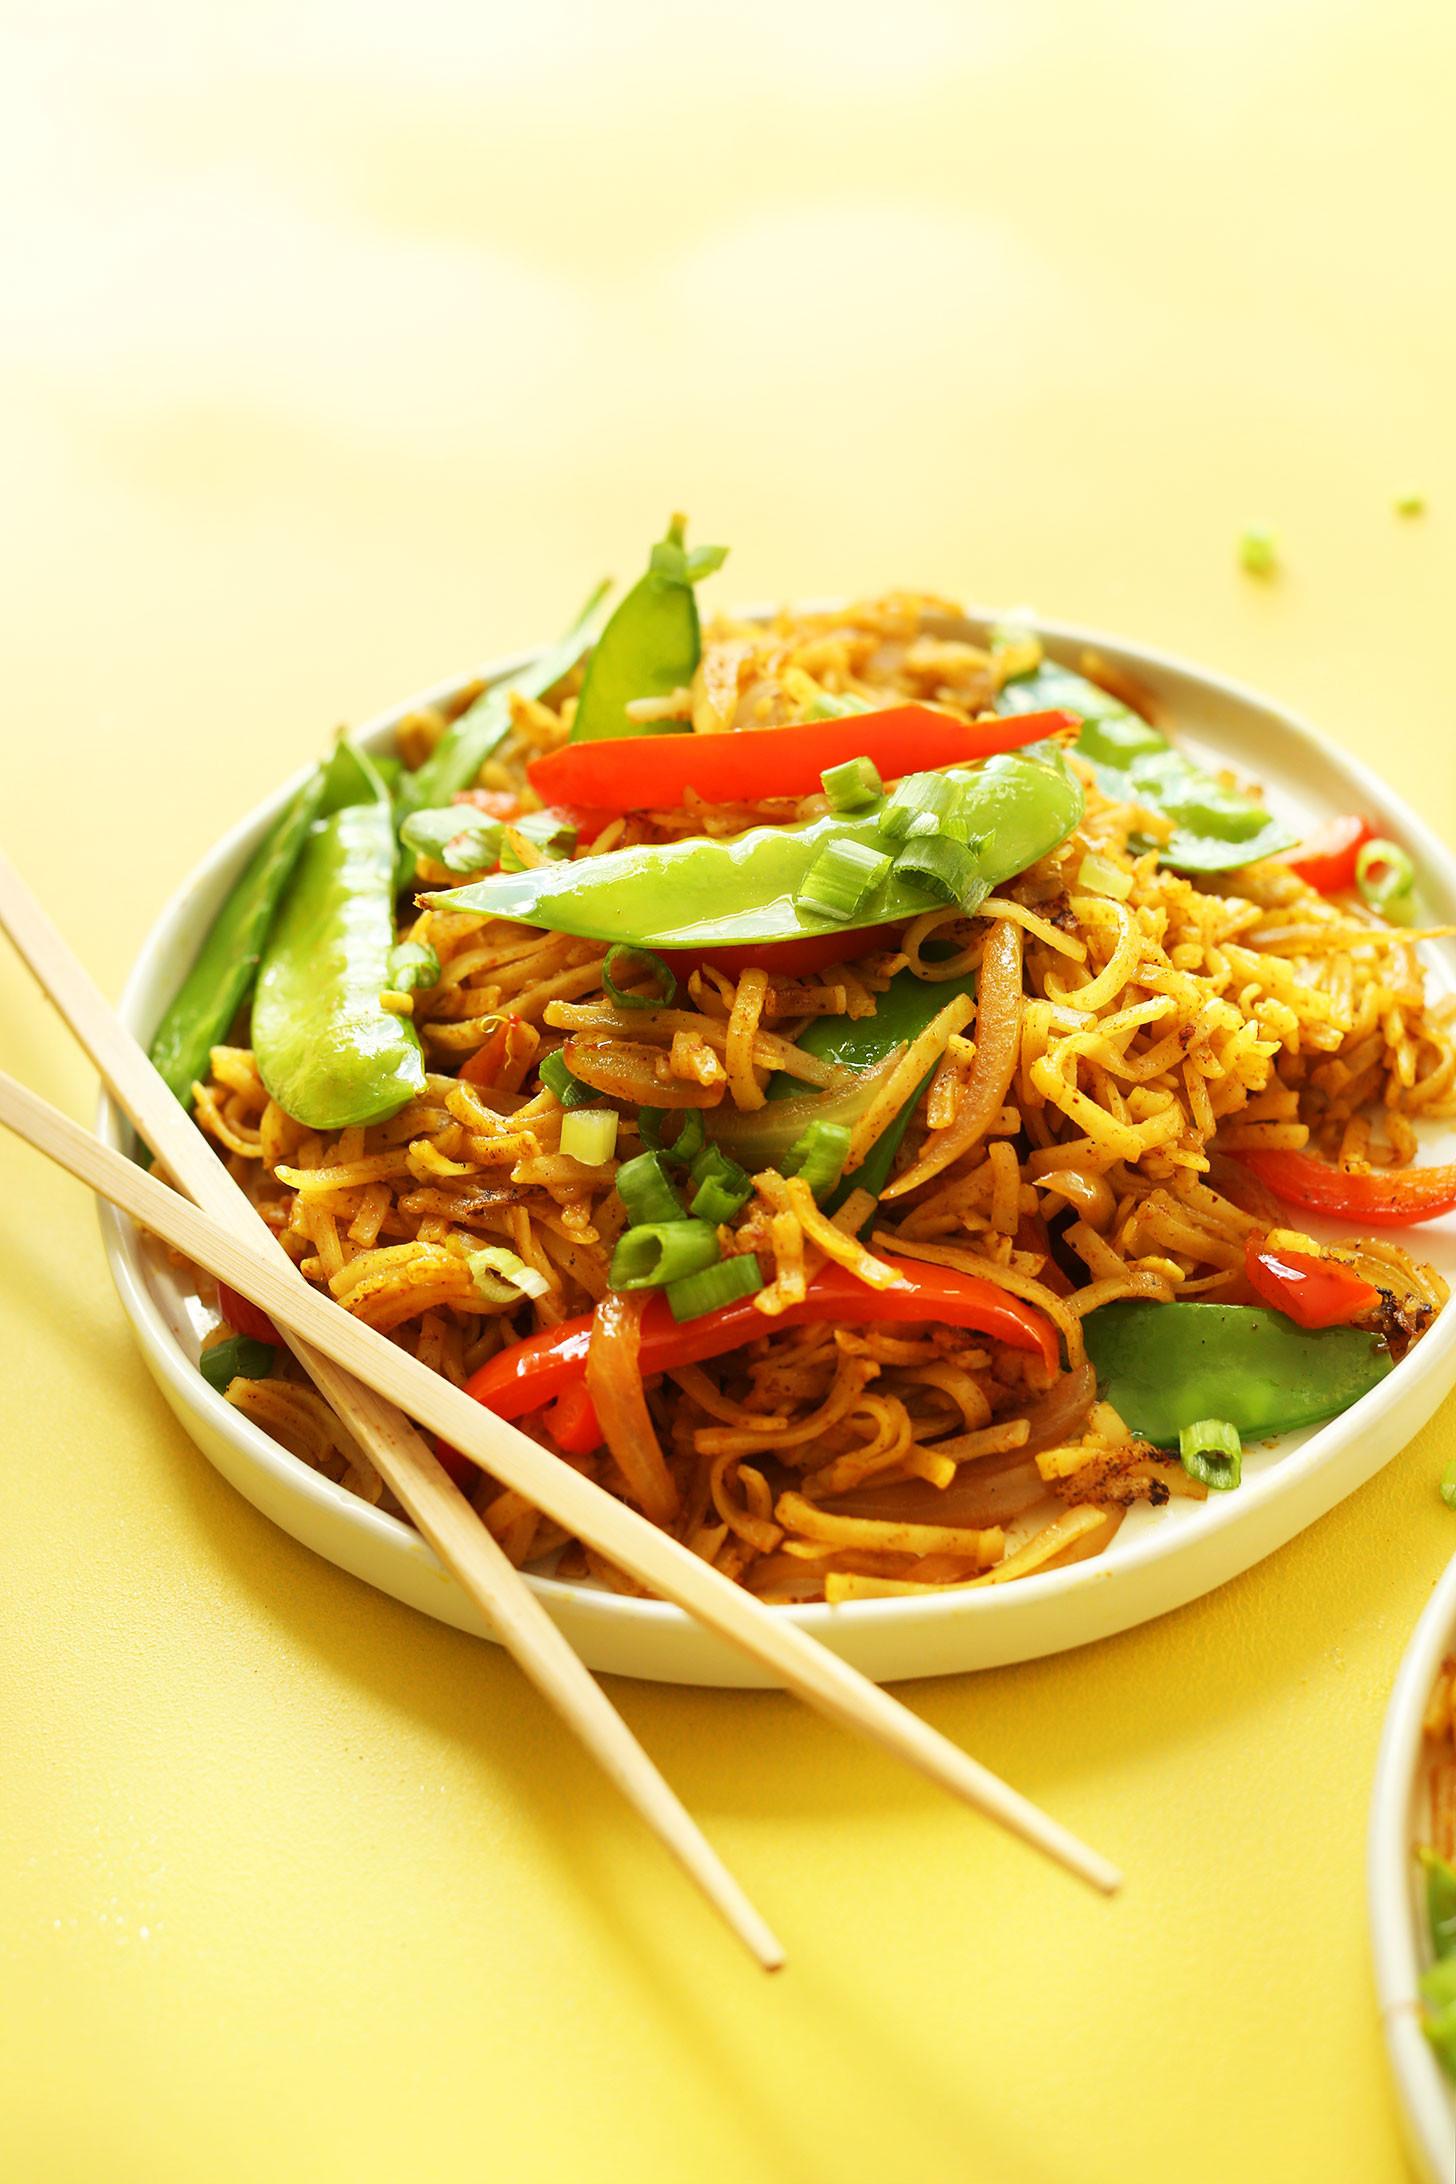 Vegetarian Rice Noodles Recipe  EASY Vegan Singapore Noodles 10 ingre nts simple